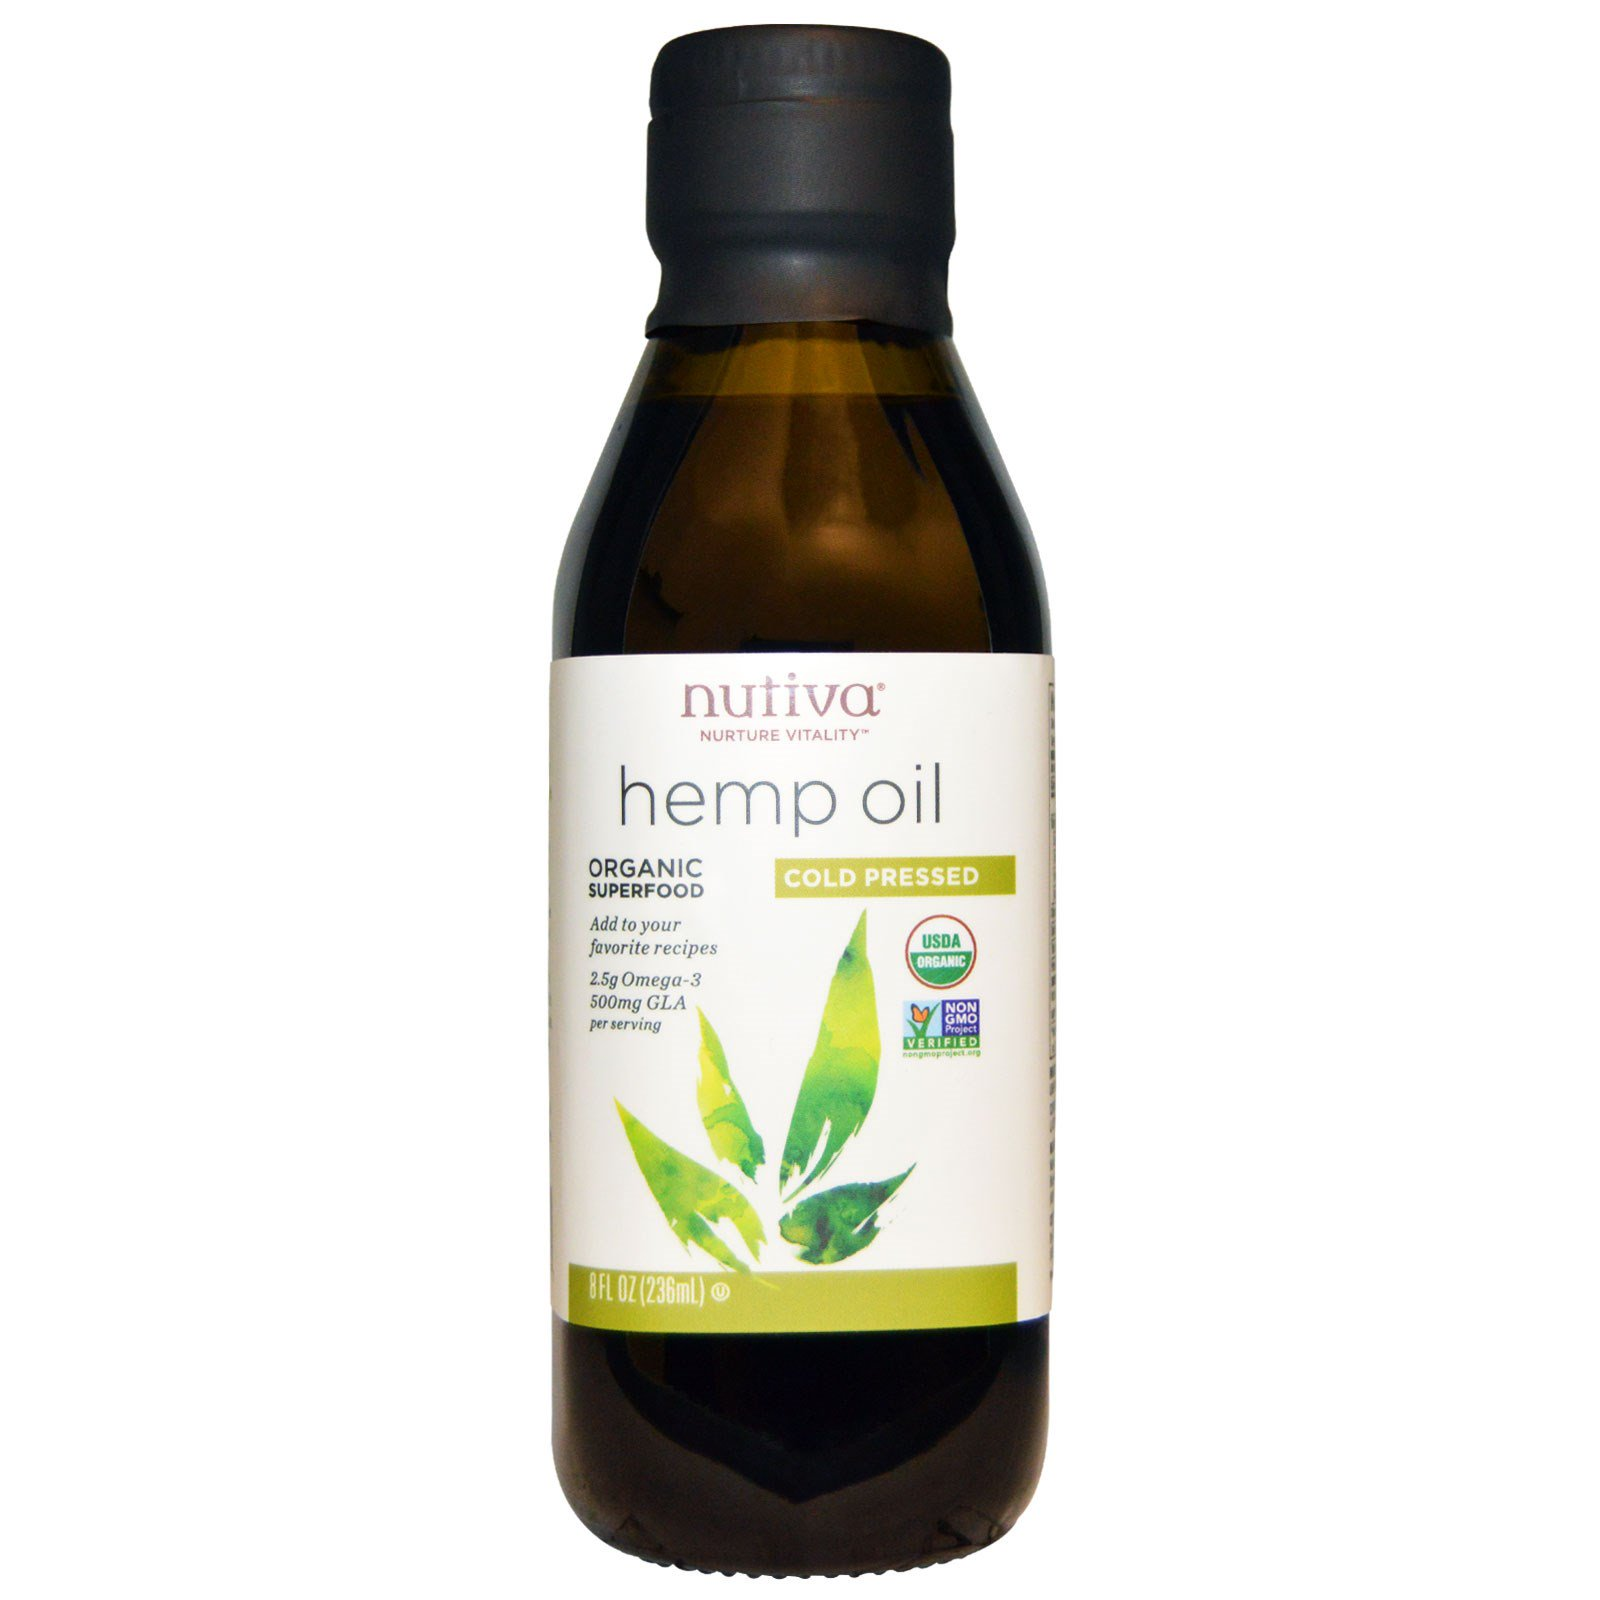 Nutiva Organic Hemp Oil Cold Pressed 8 Fl Oz 236 Ml Iherb